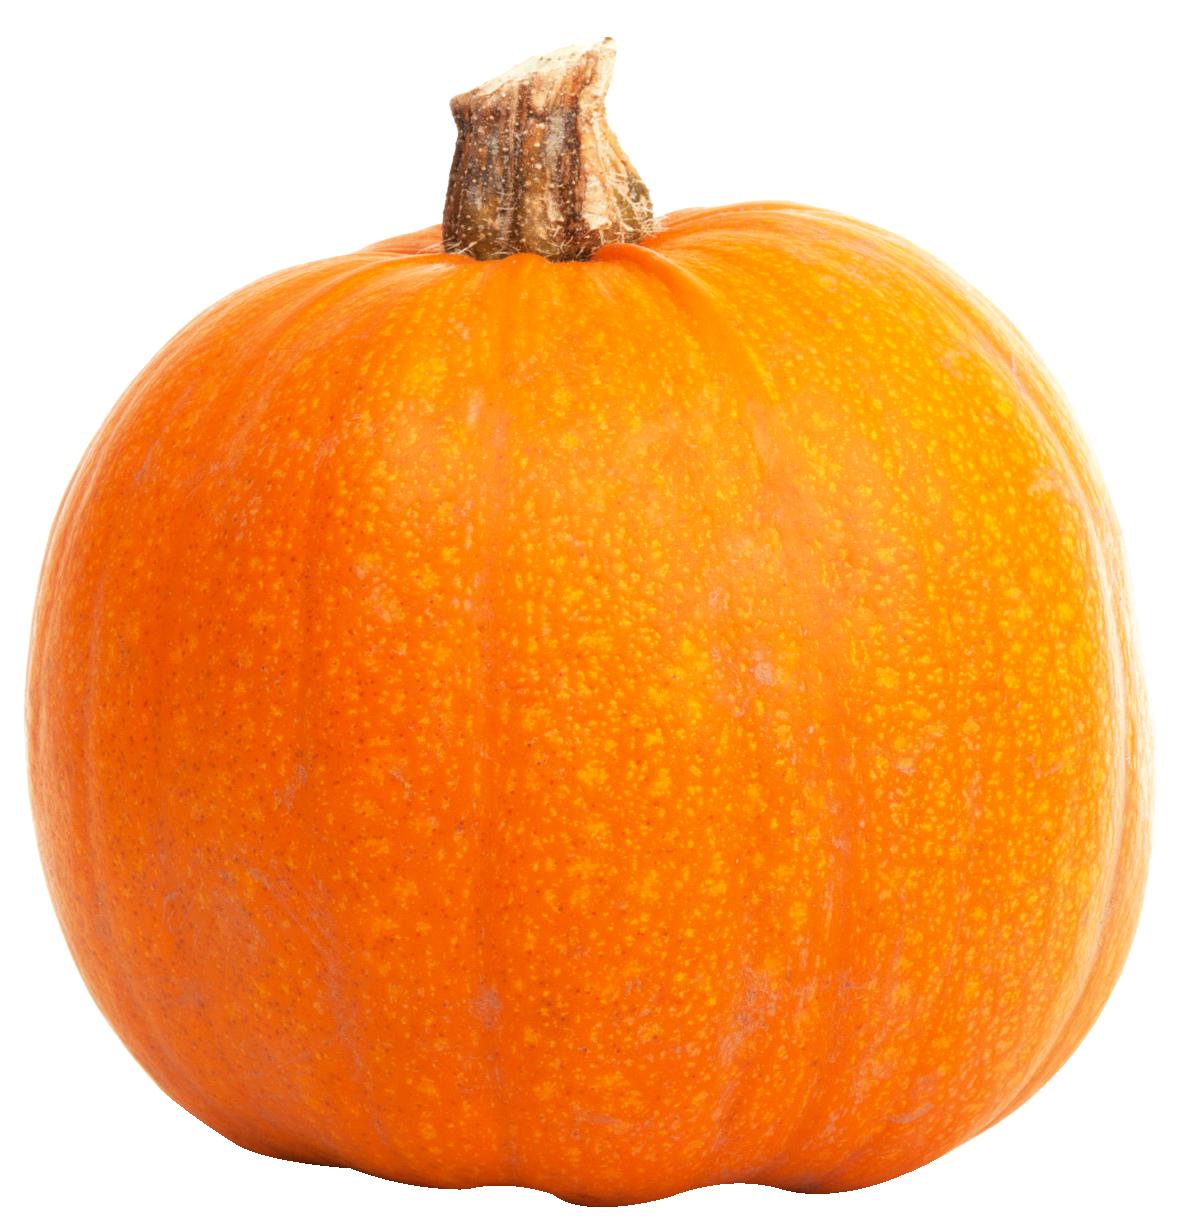 Fresh Orange Pumpkin PNG image - Pumpkin PNG